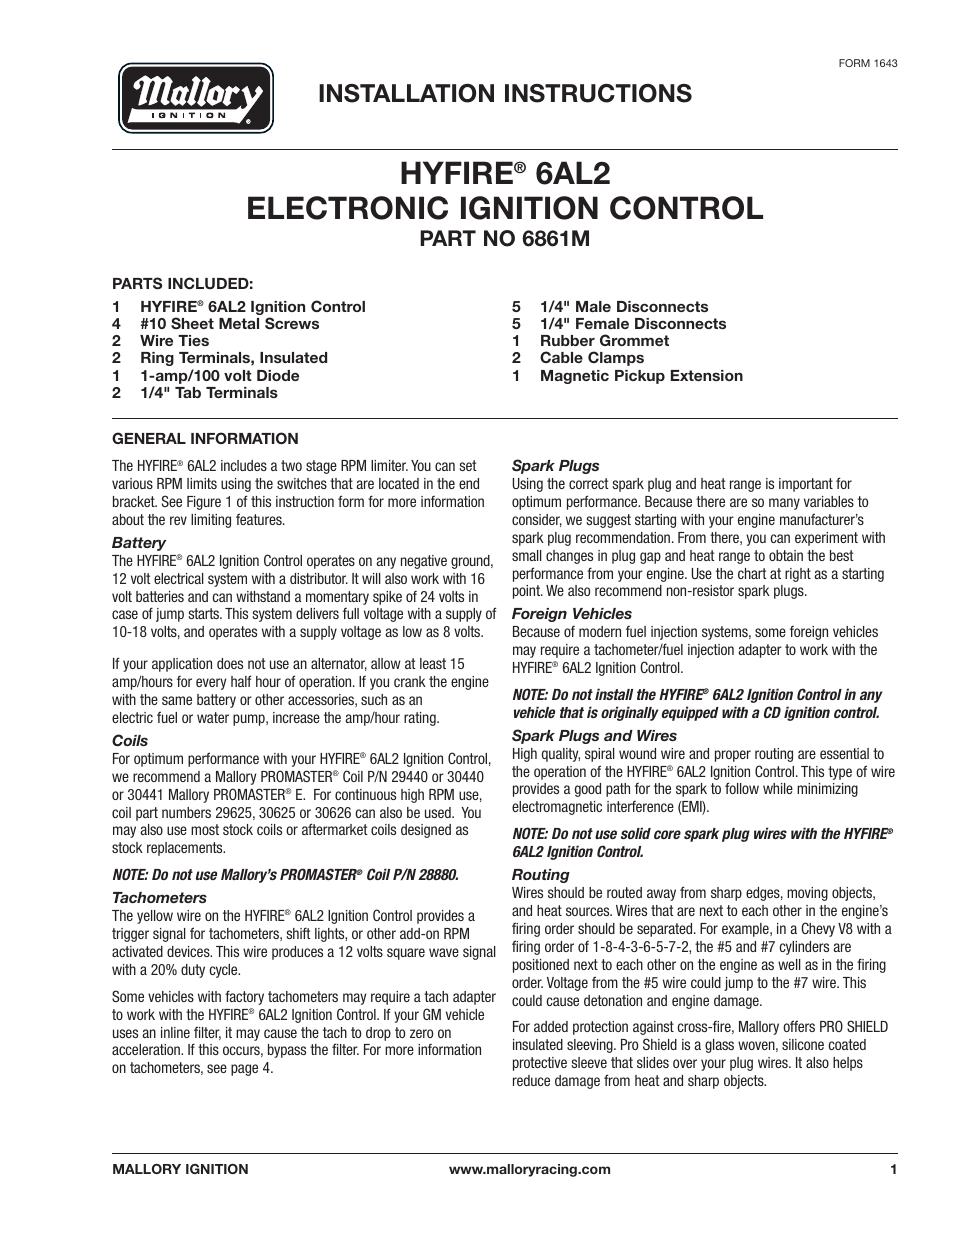 mallory ignition mallory hyfire 6al2 electronic ignition control 6861m page1?resize\\\\\\\\\=665%2C861 mallory hyfire 6853m wiring diagram wiring diagram shrutiradio Fuse Box to Breaker Box at virtualis.co